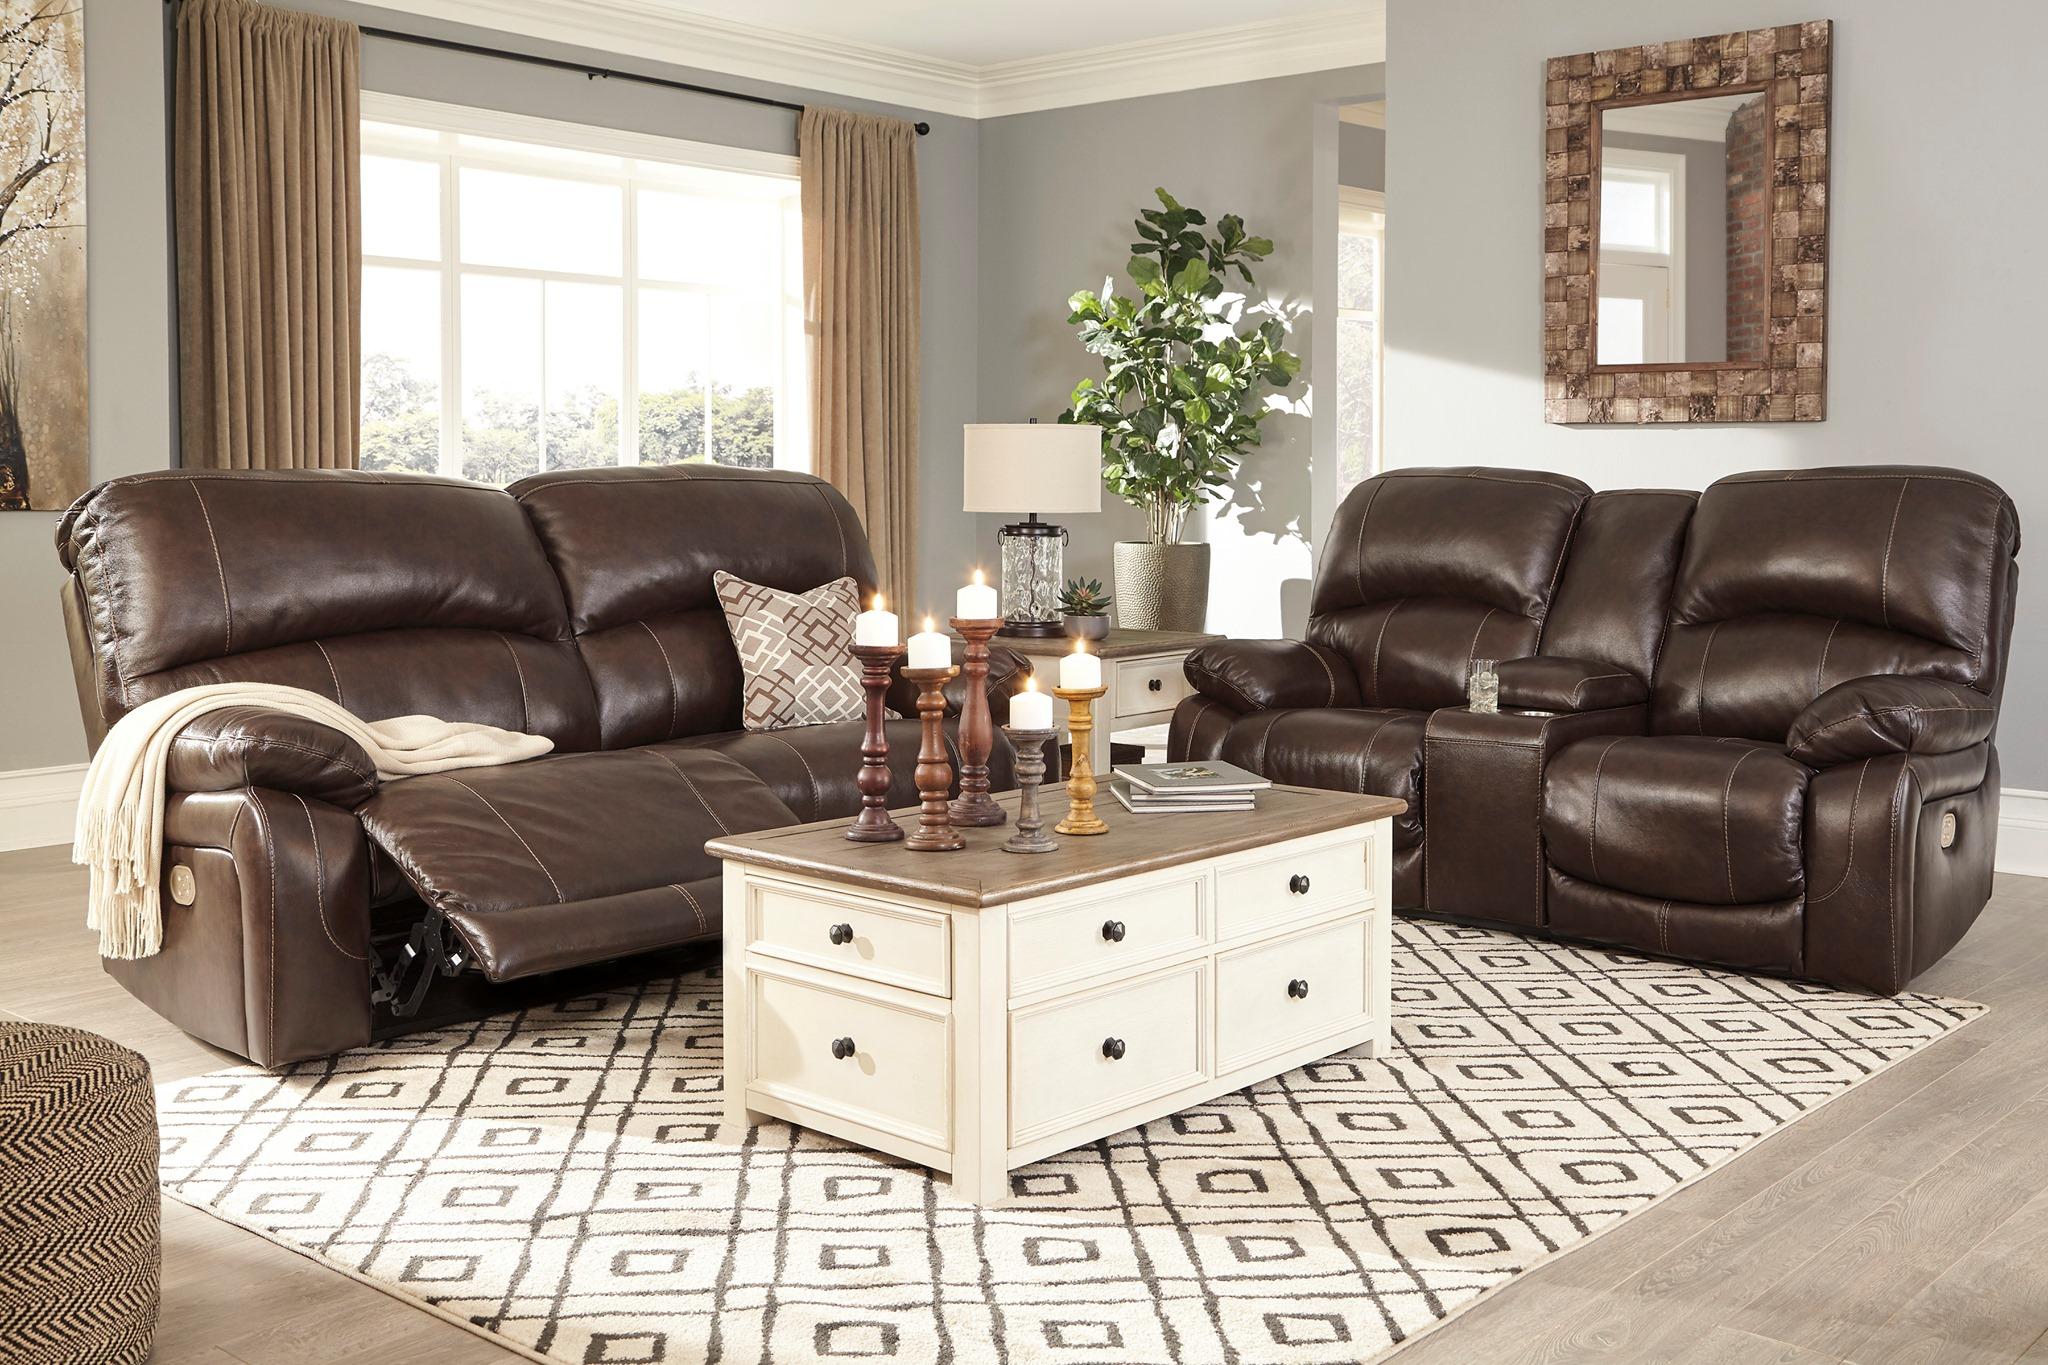 Ashley Furniture HomeStore 1150 Hanes Mall Blvd, Winston-Salem